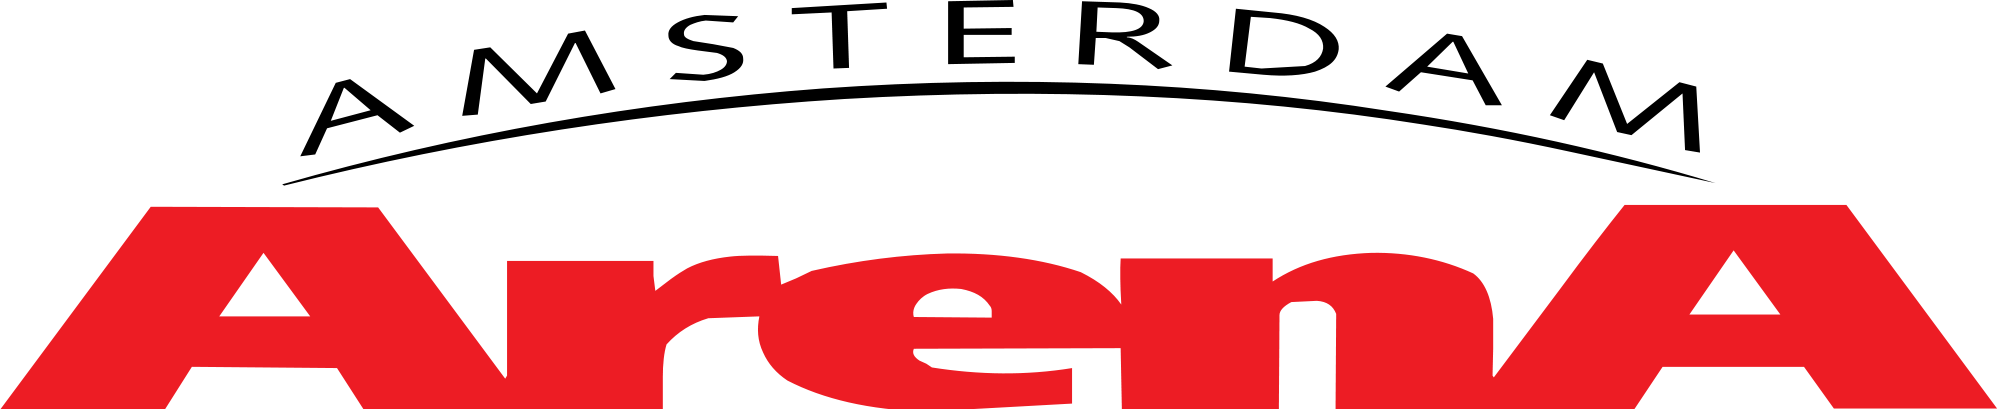 Arena Logo PNG - 28999